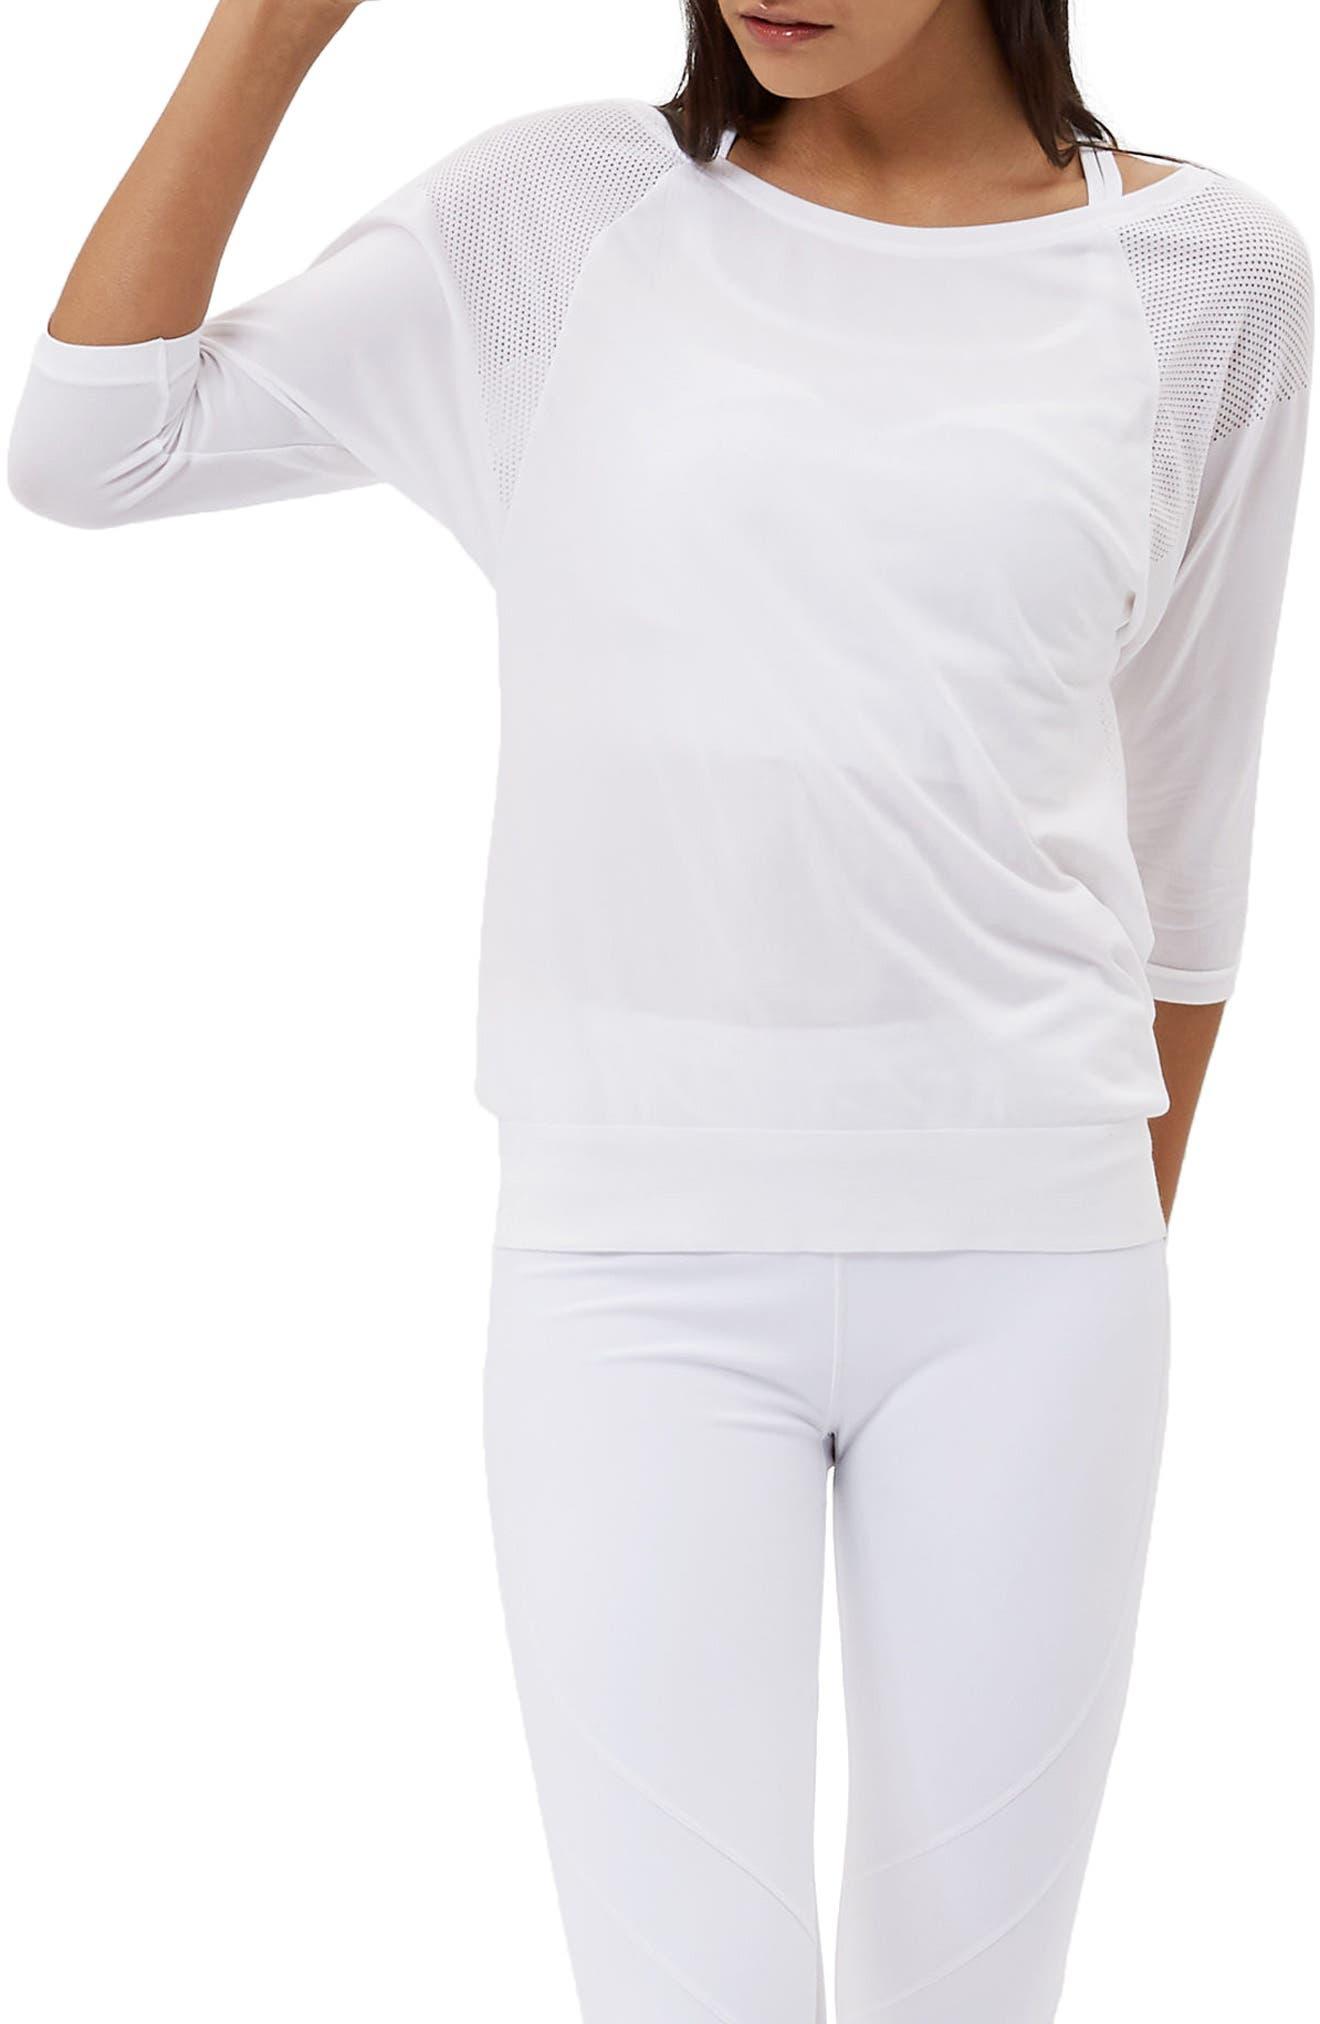 Dharana Yoga Tee,                             Main thumbnail 1, color,                             White